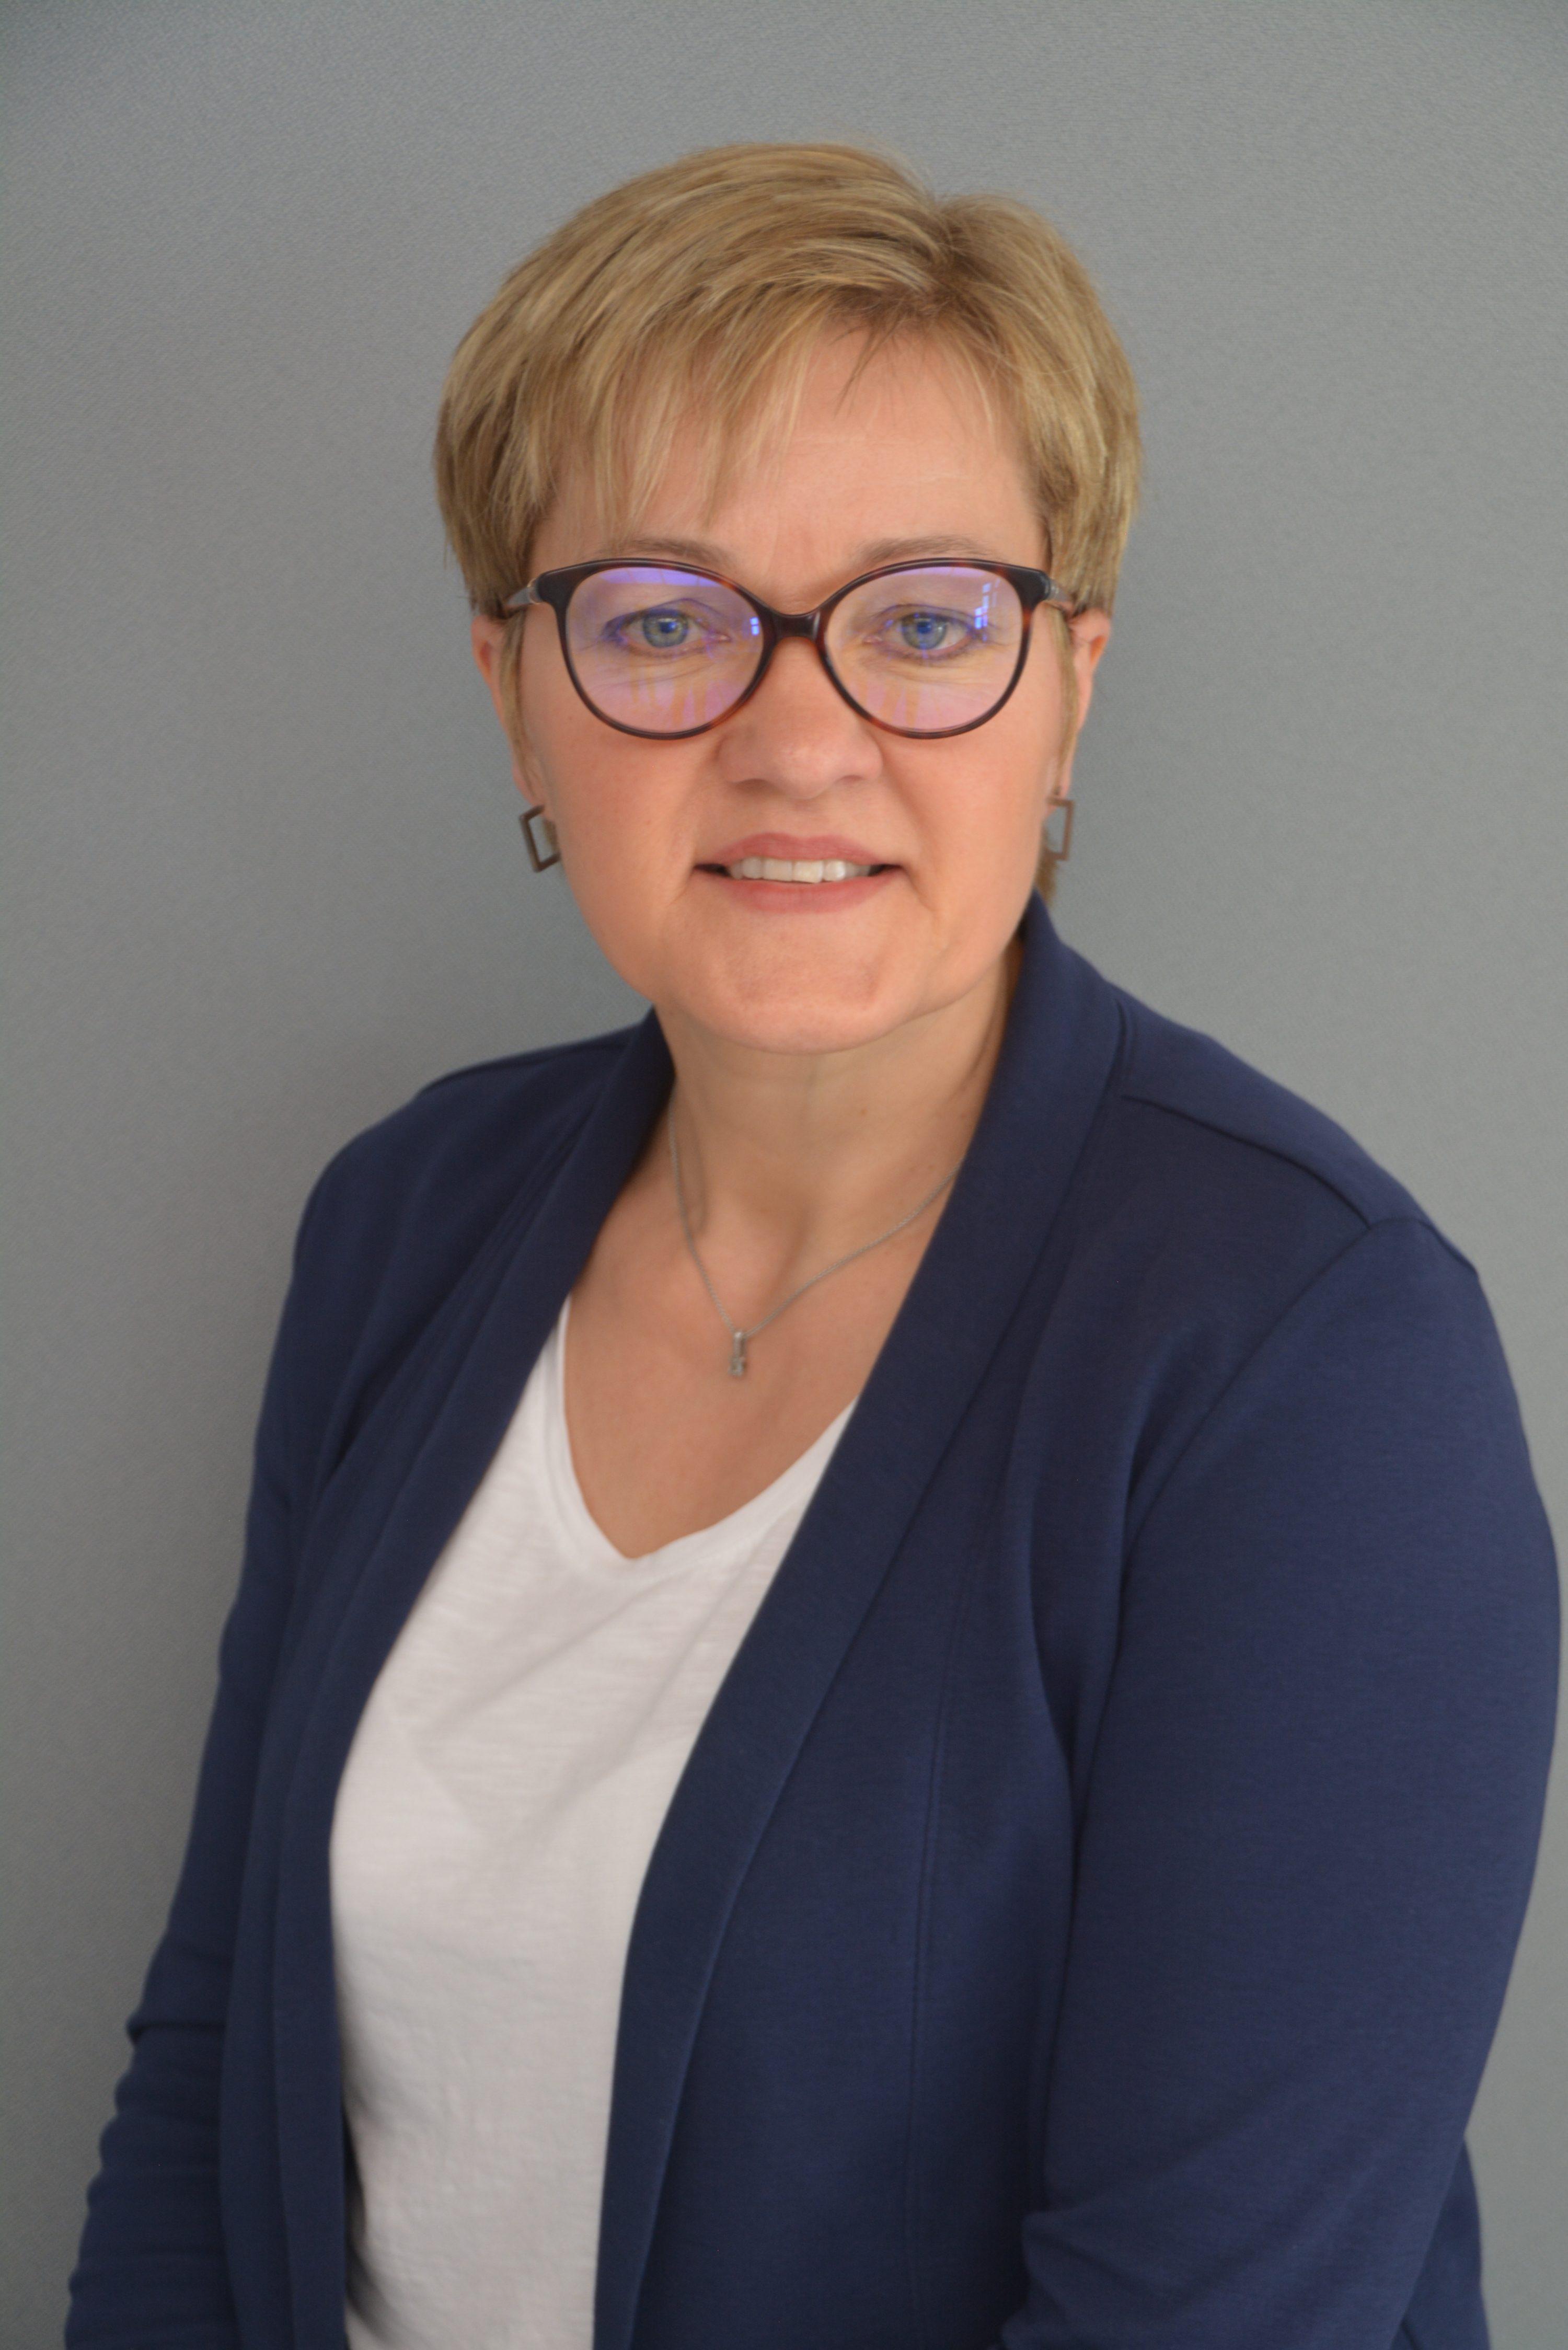 Irina Müller